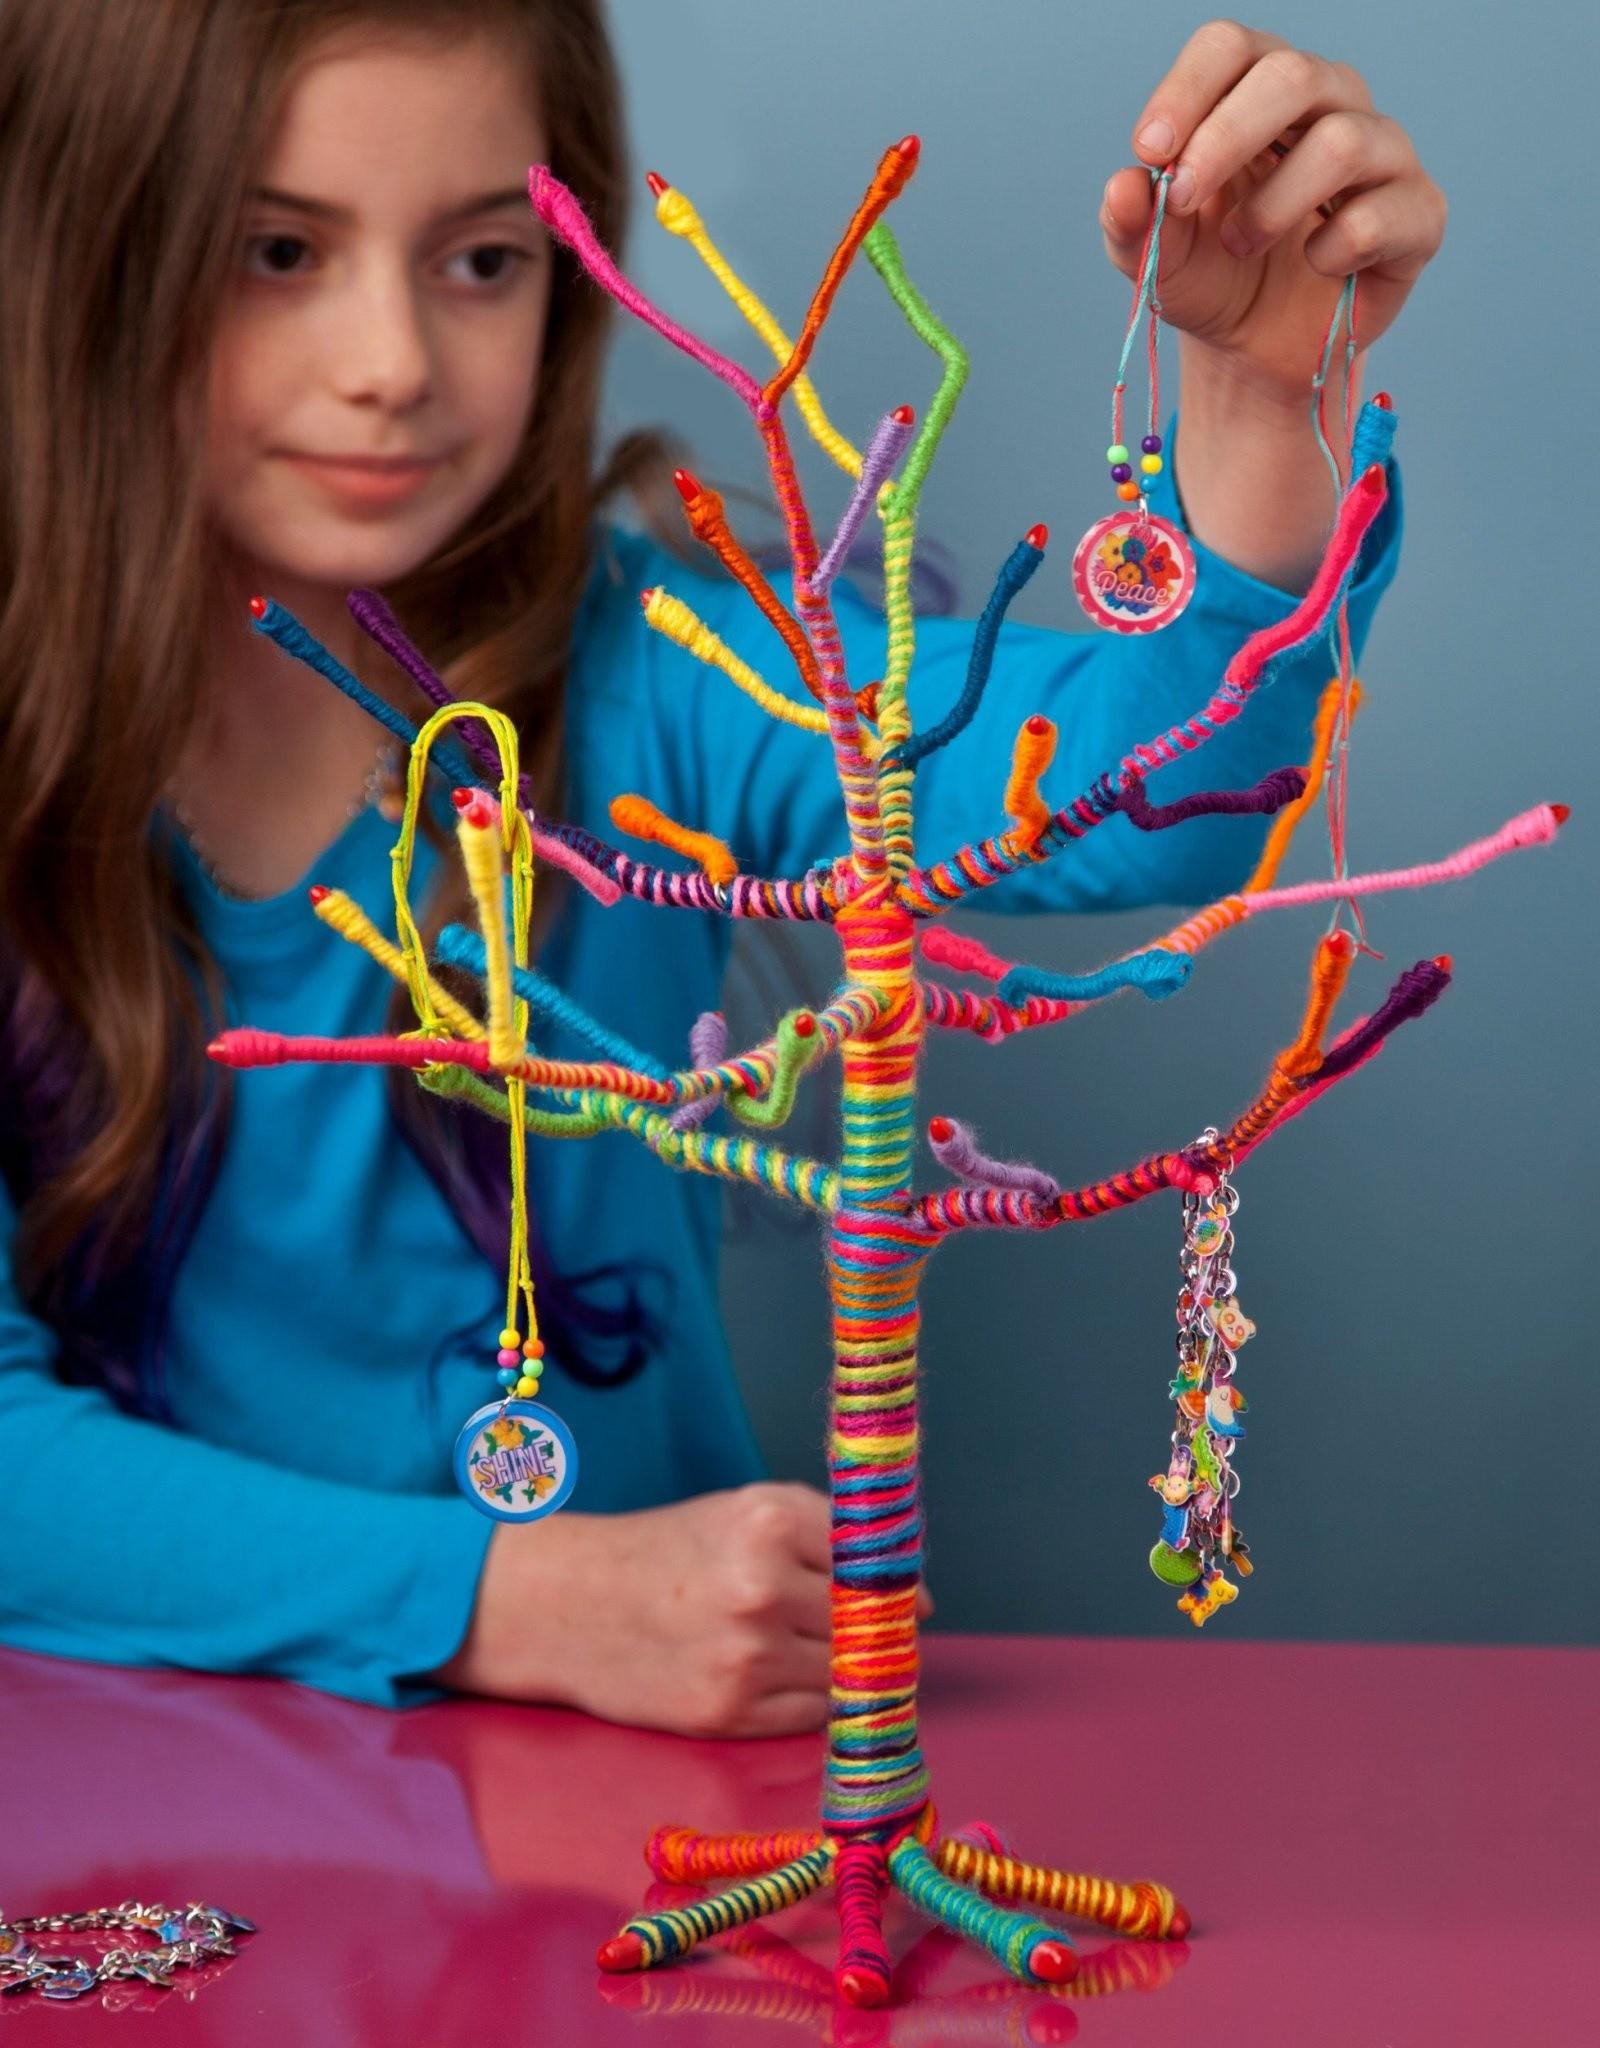 Ann Williams Craft-tastic Yarn Tree Kit